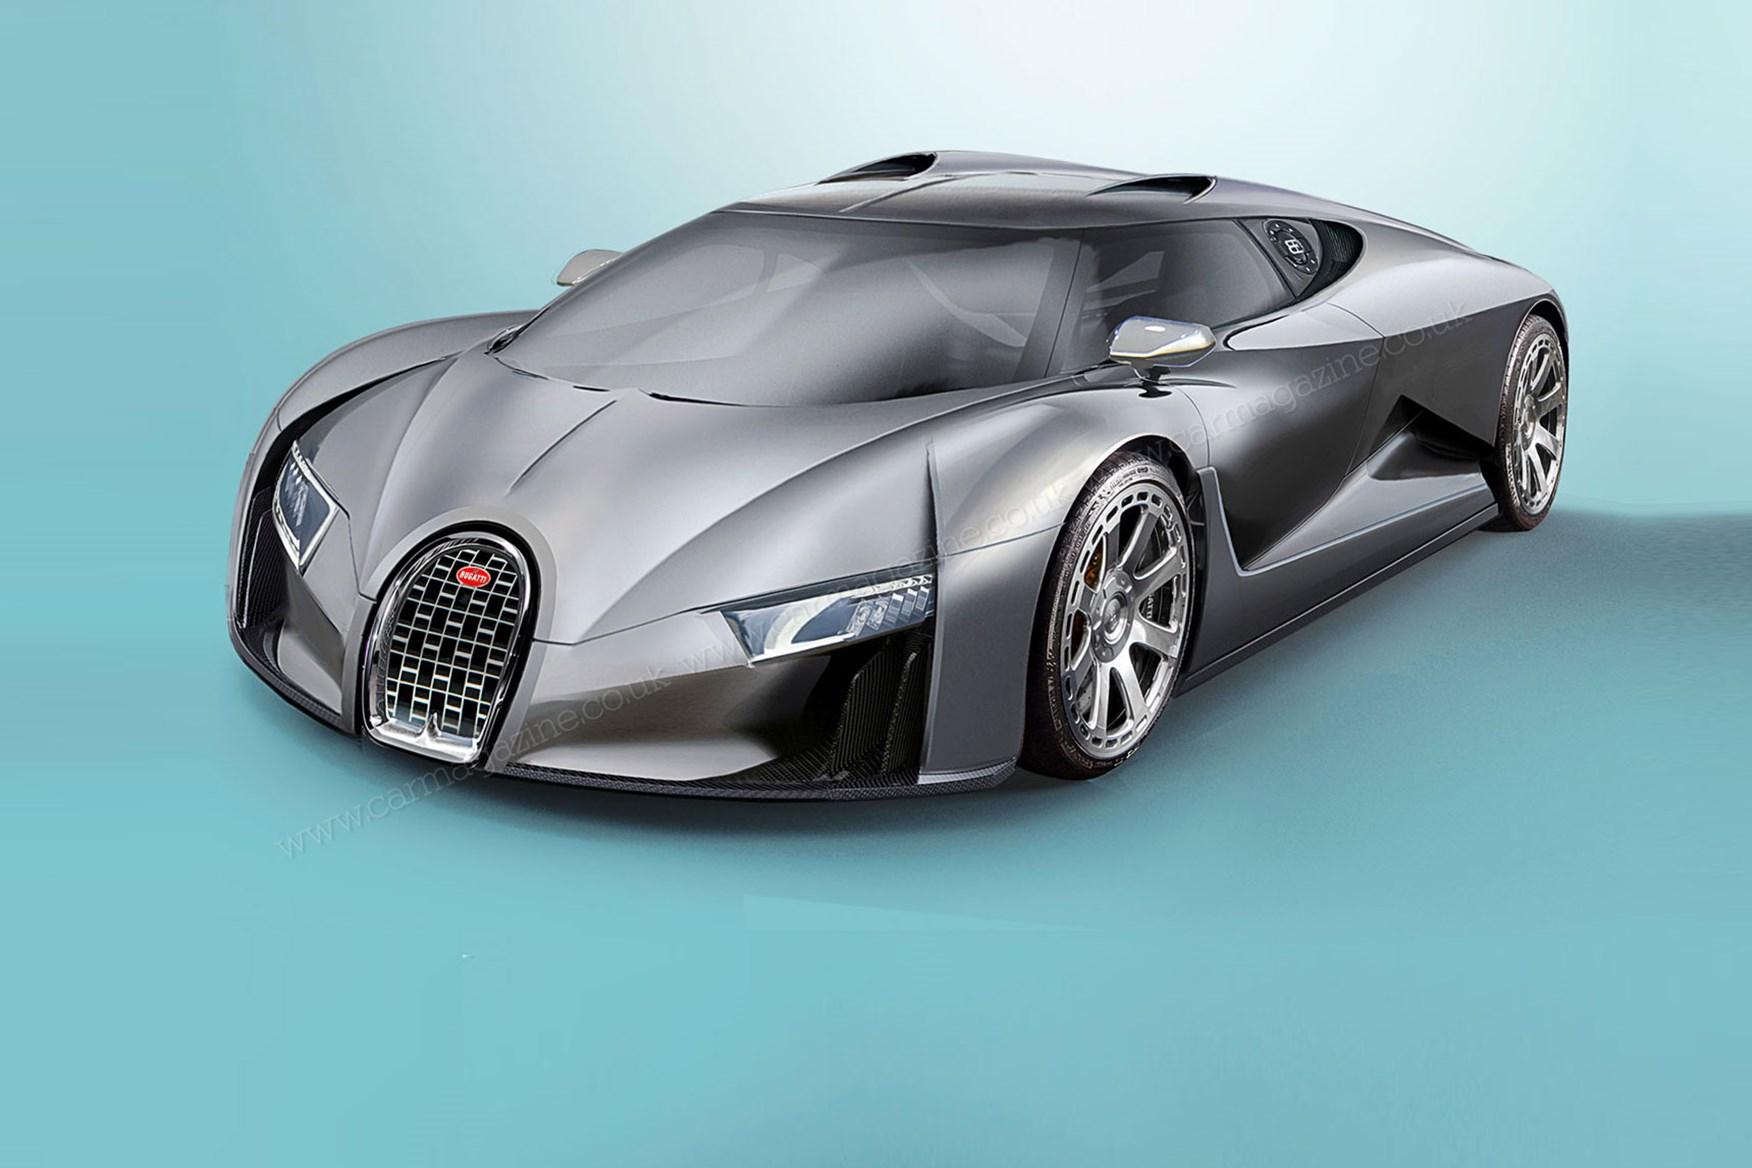 ... Bugatti Chiron: Artistu0027s Impression By CAR The Bugatti Veyron ...